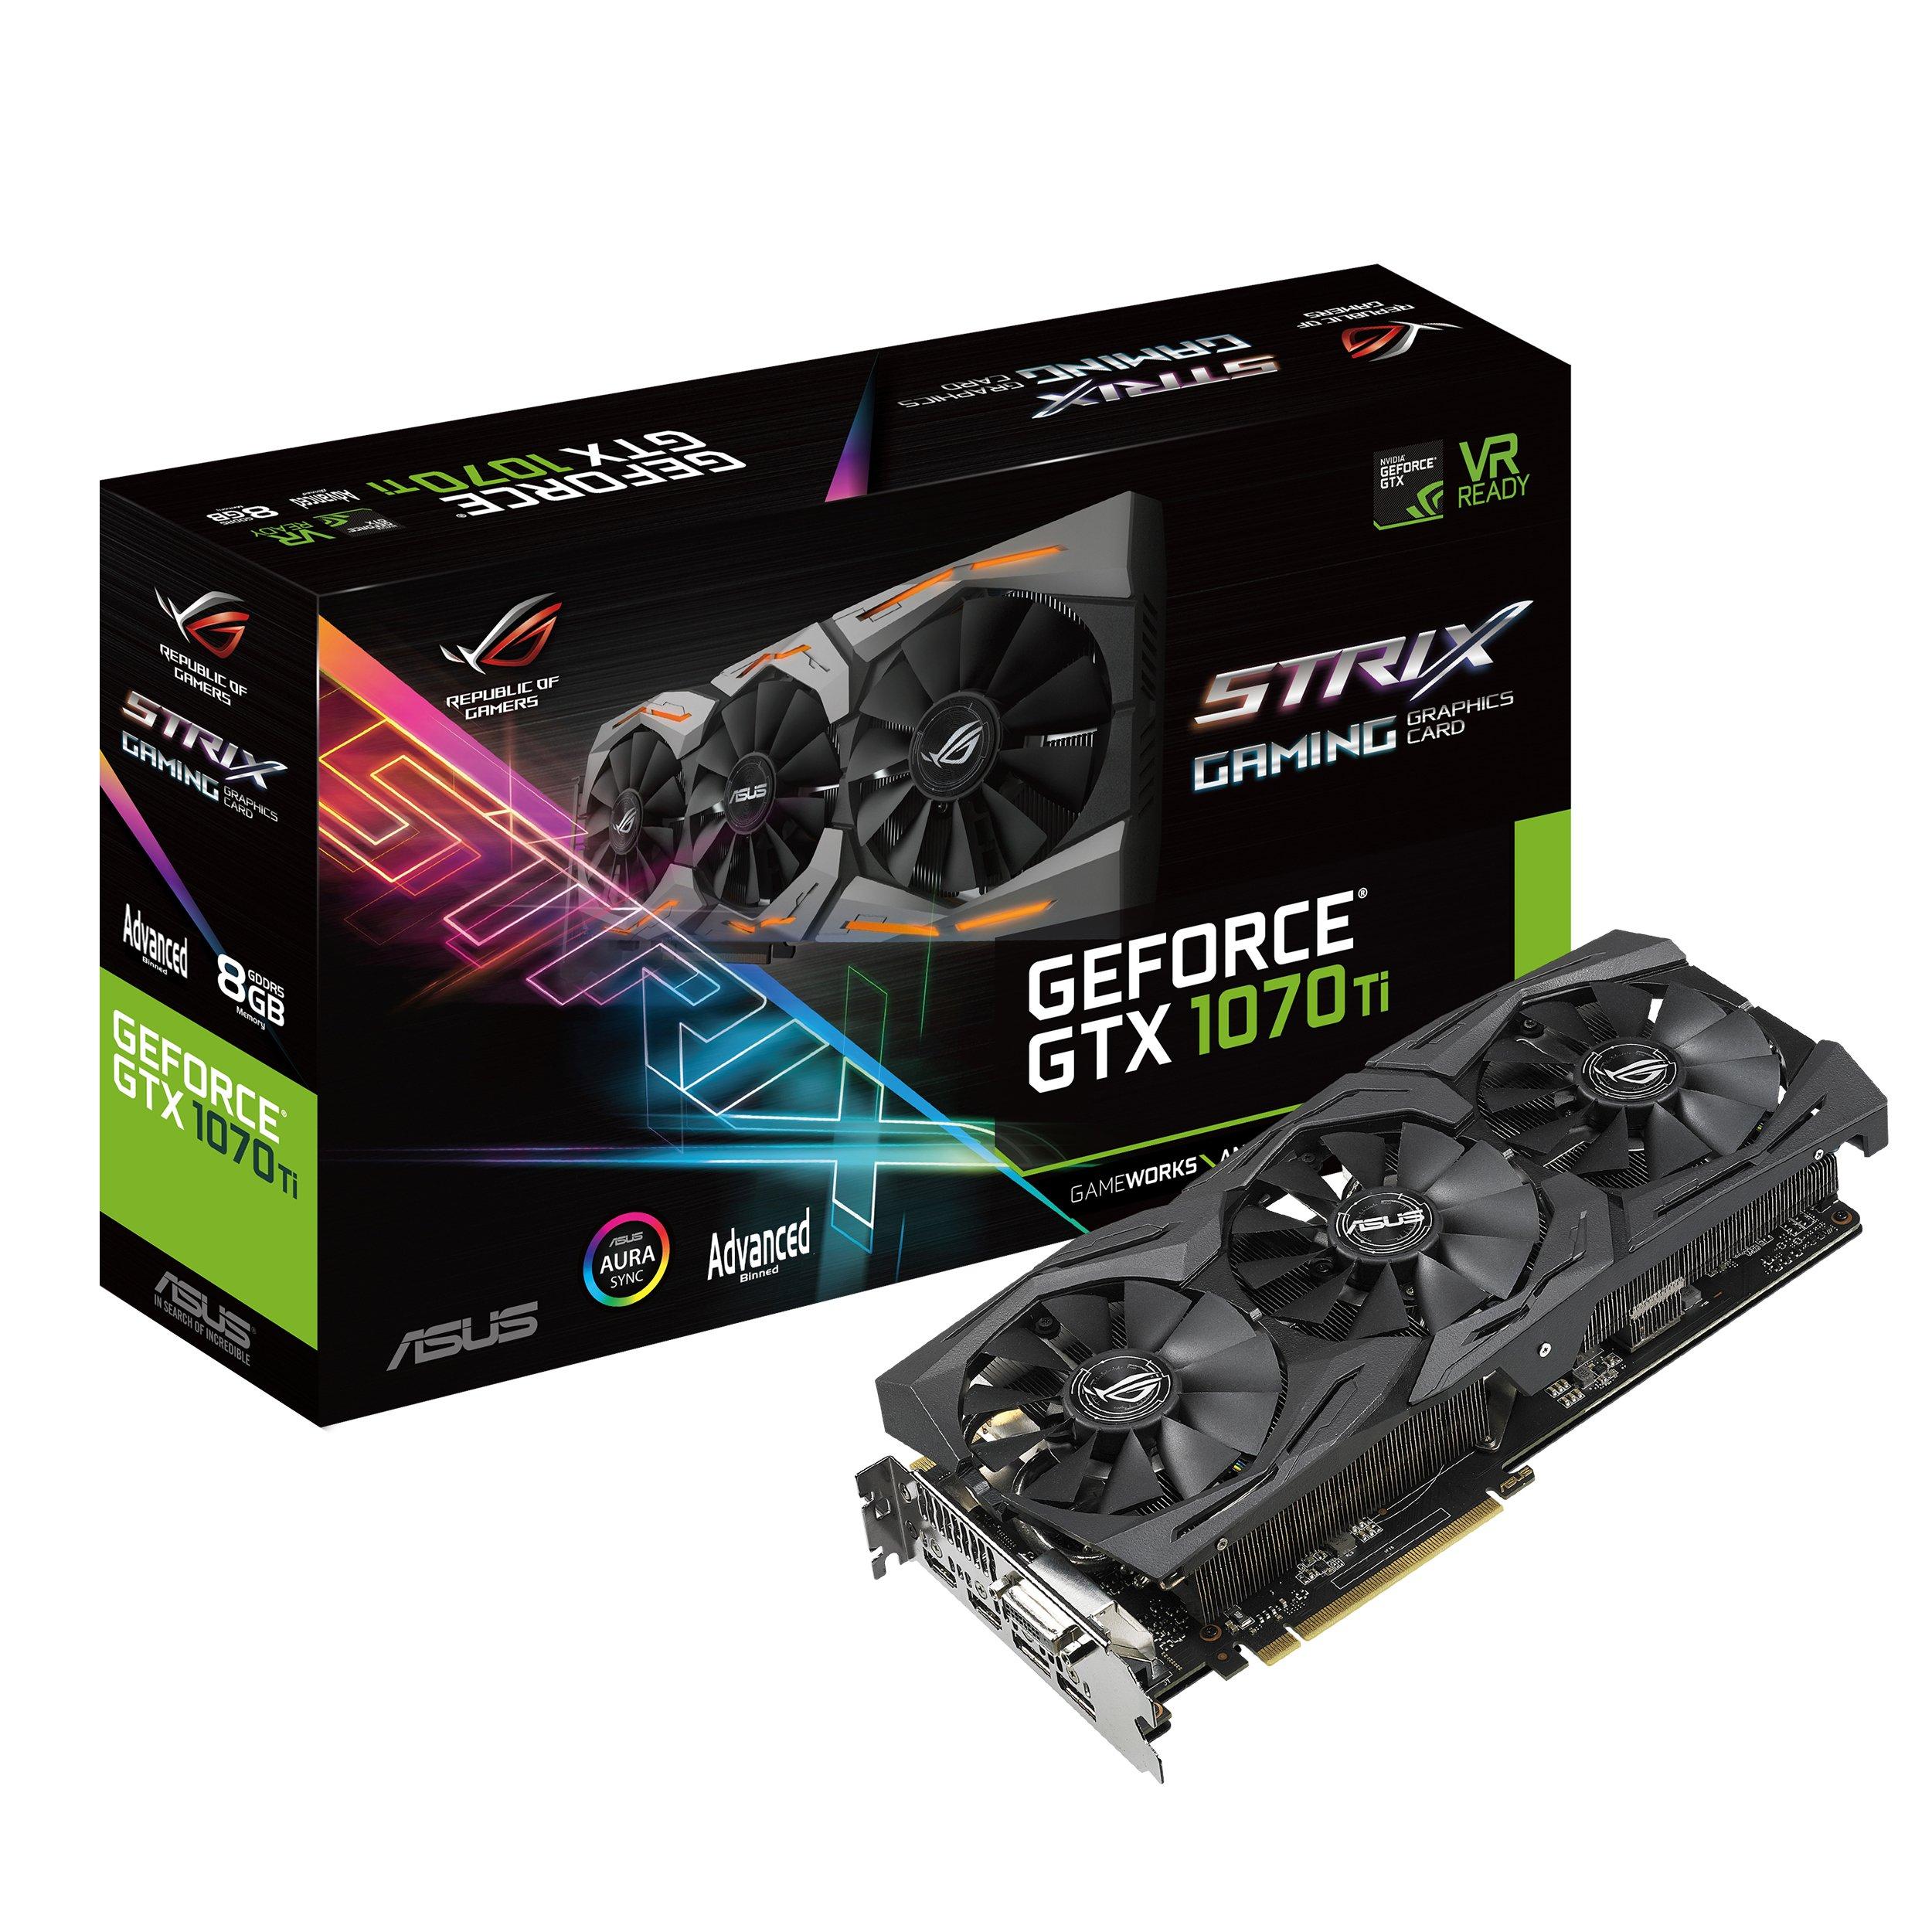 ASUS ROG Strix GeForce GTX 1070 Ti 8GB GDDR5 Advanced Edition VR Ready DP HDMI DVI Gaming Graphics Card (ROG-STRIX-GTX1070TI-A8G-GAMING) by Asus